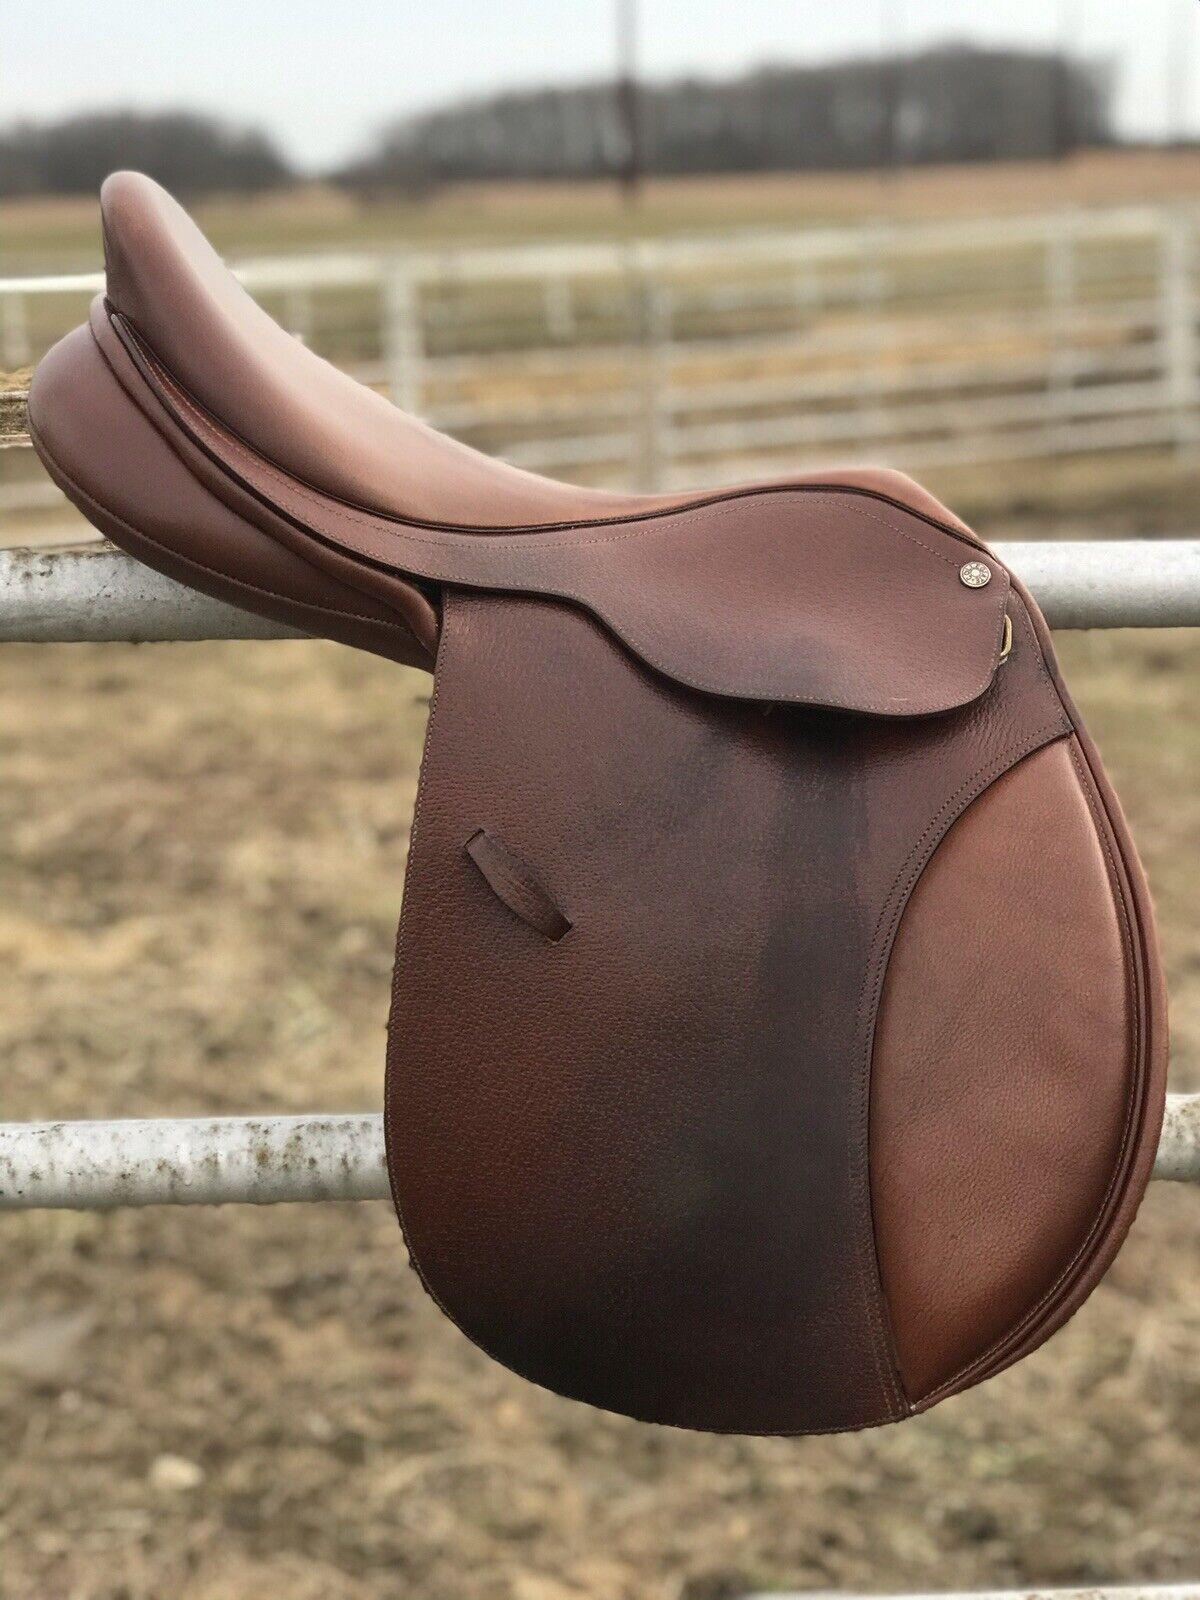 17-1  2  Collegiate Congreenible saddle  offering store